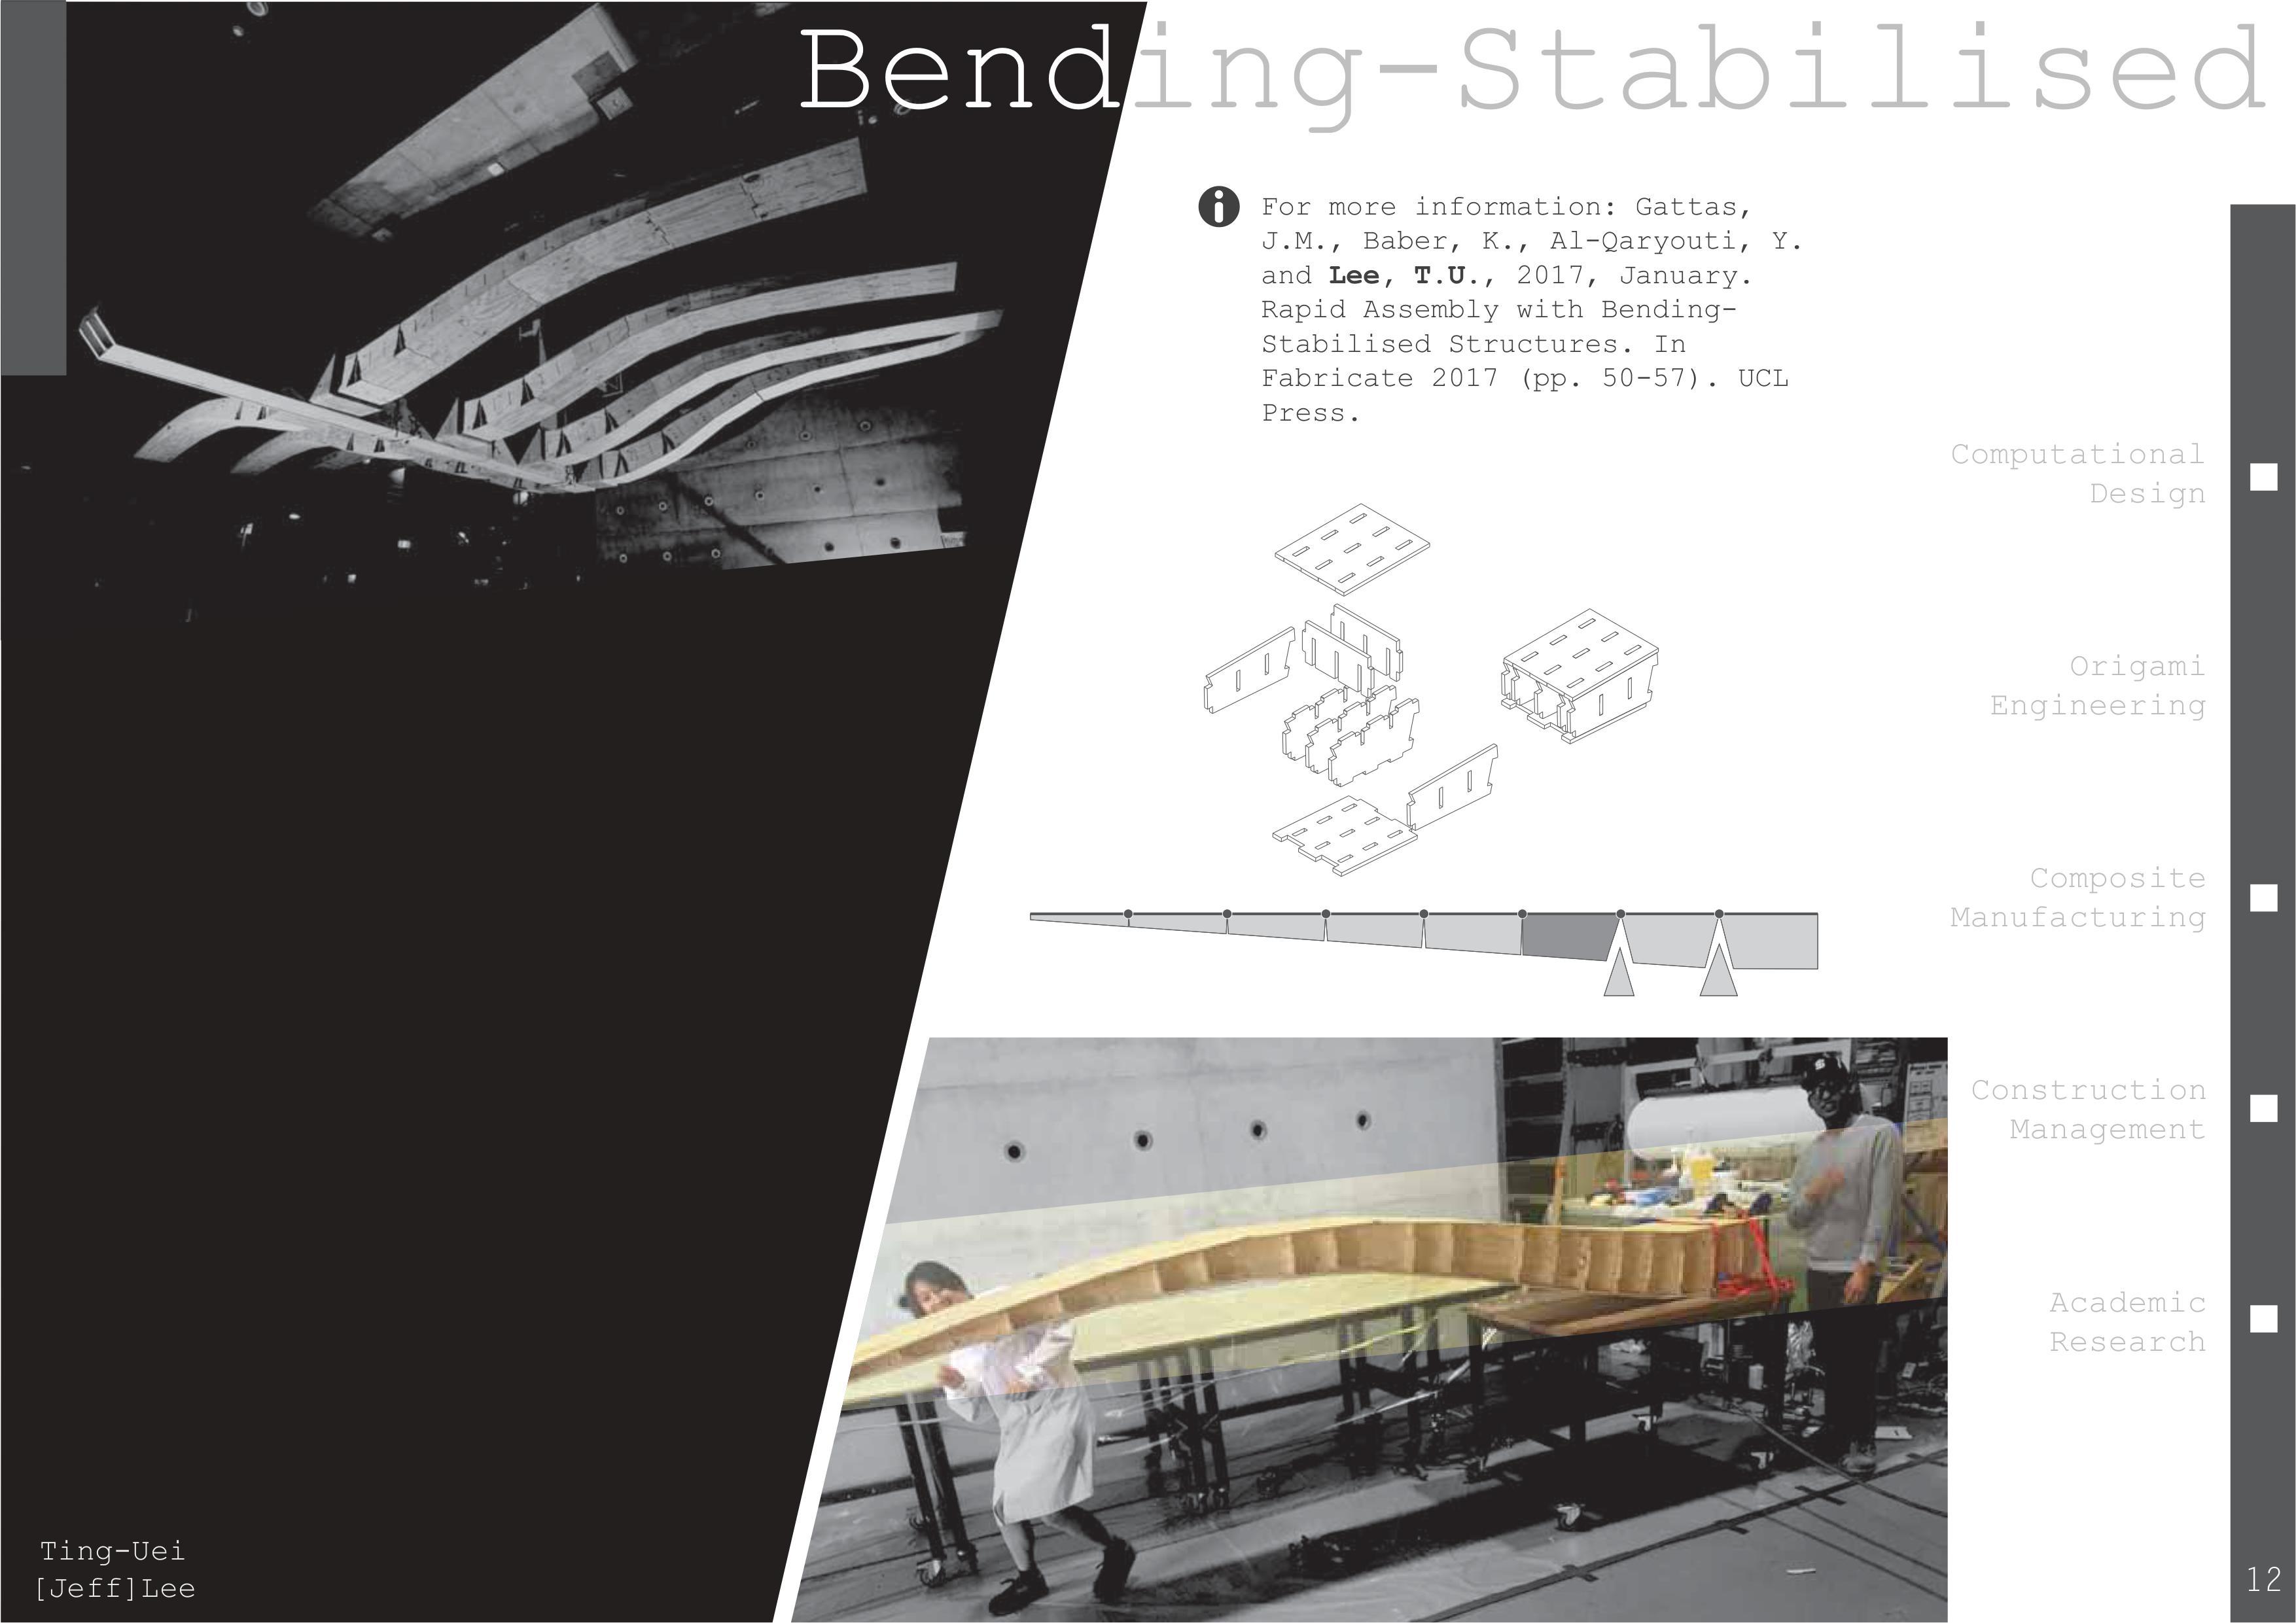 Bending-Stabilised